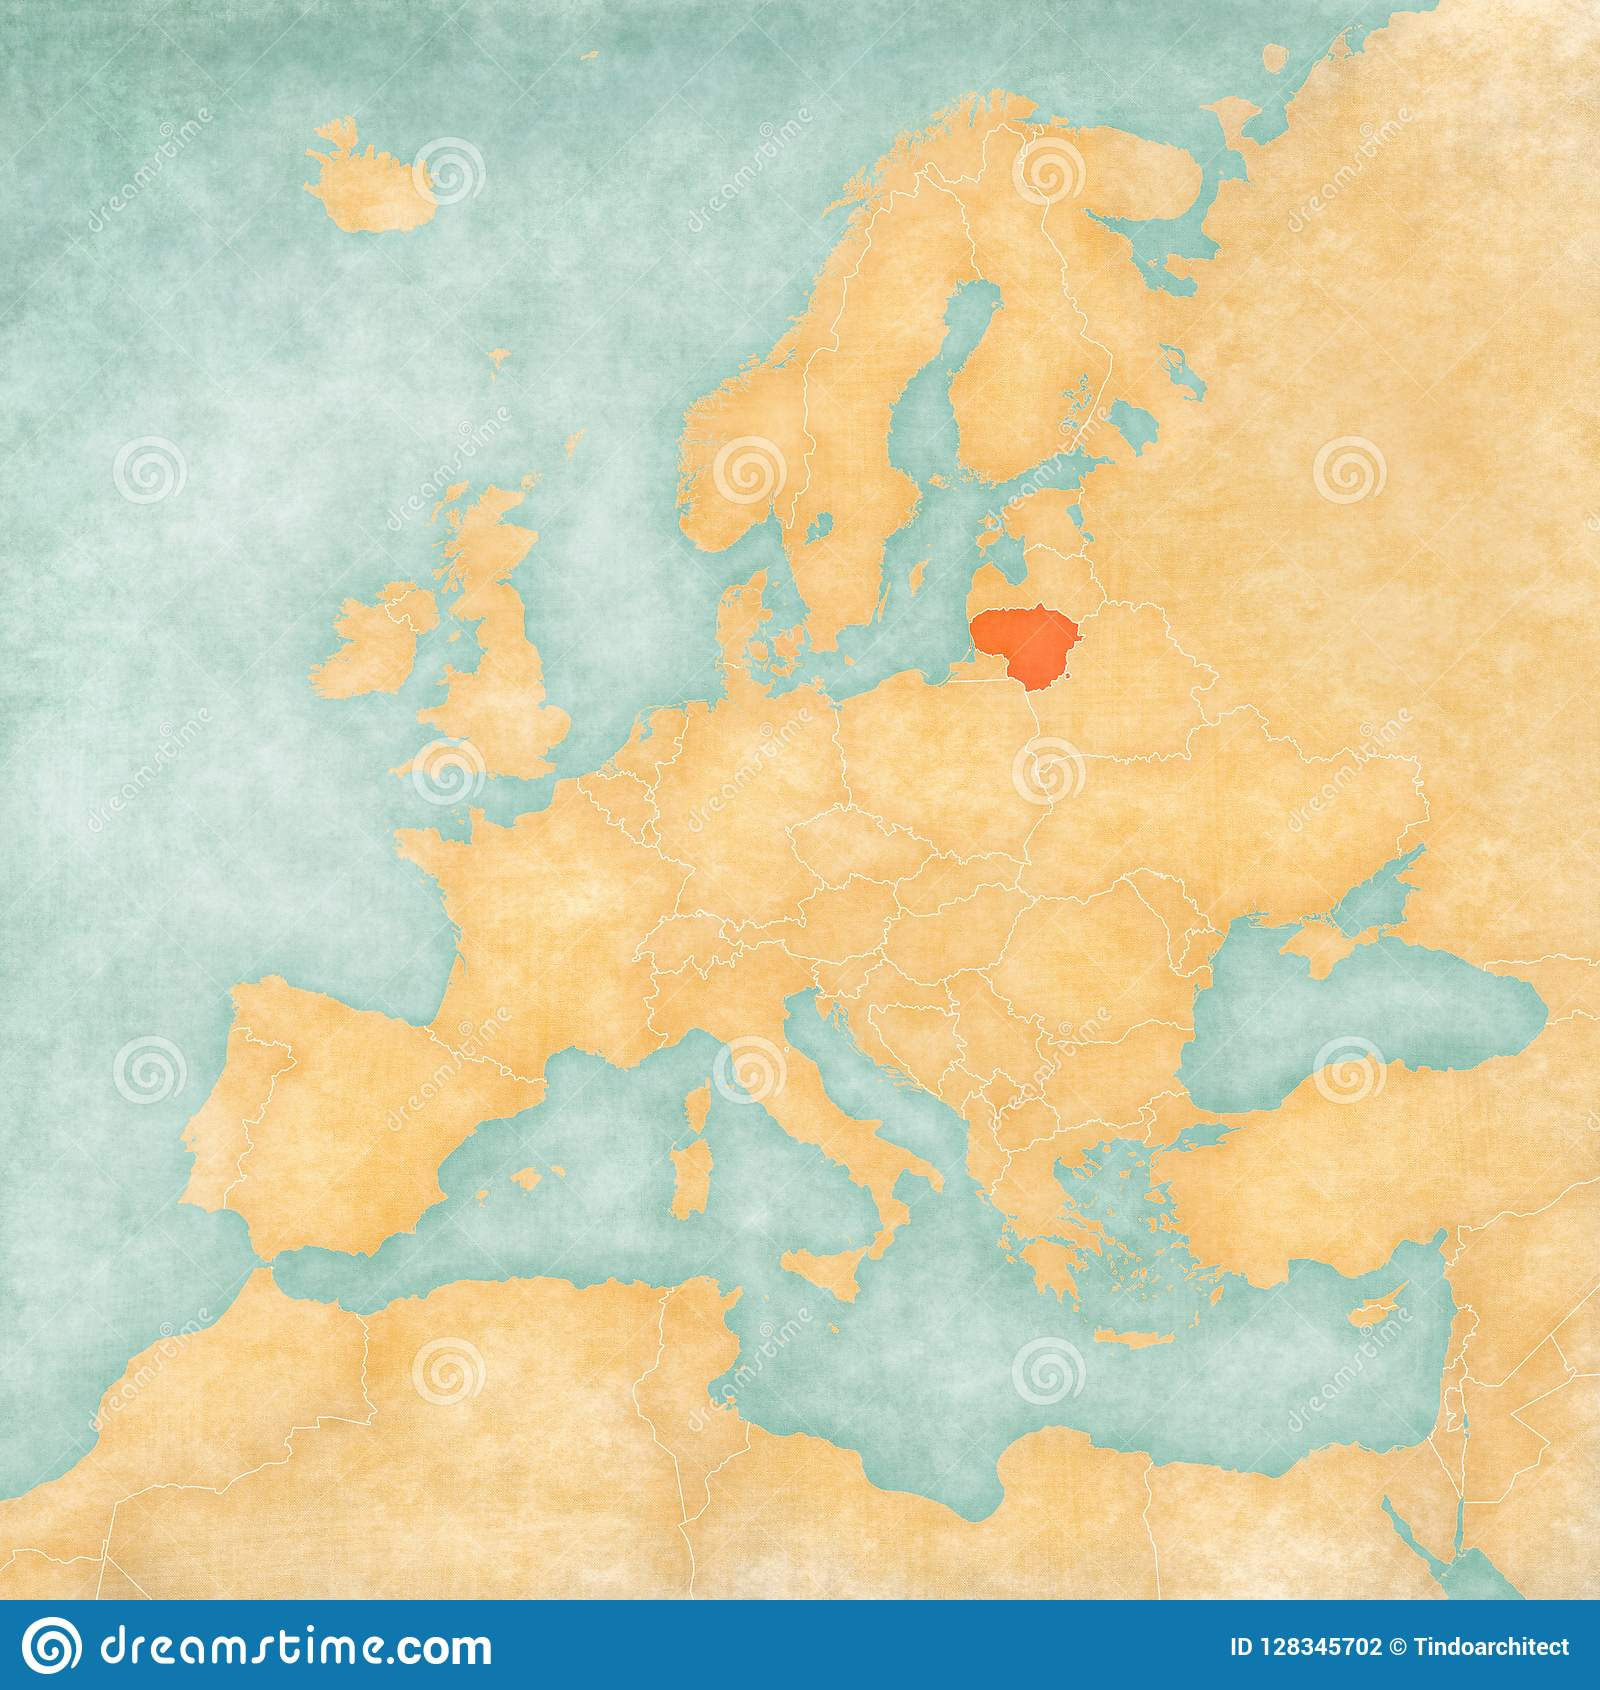 Lithuania On Europe Map.Map Of Europe Lithuania Stock Illustration Illustration Of Grunge